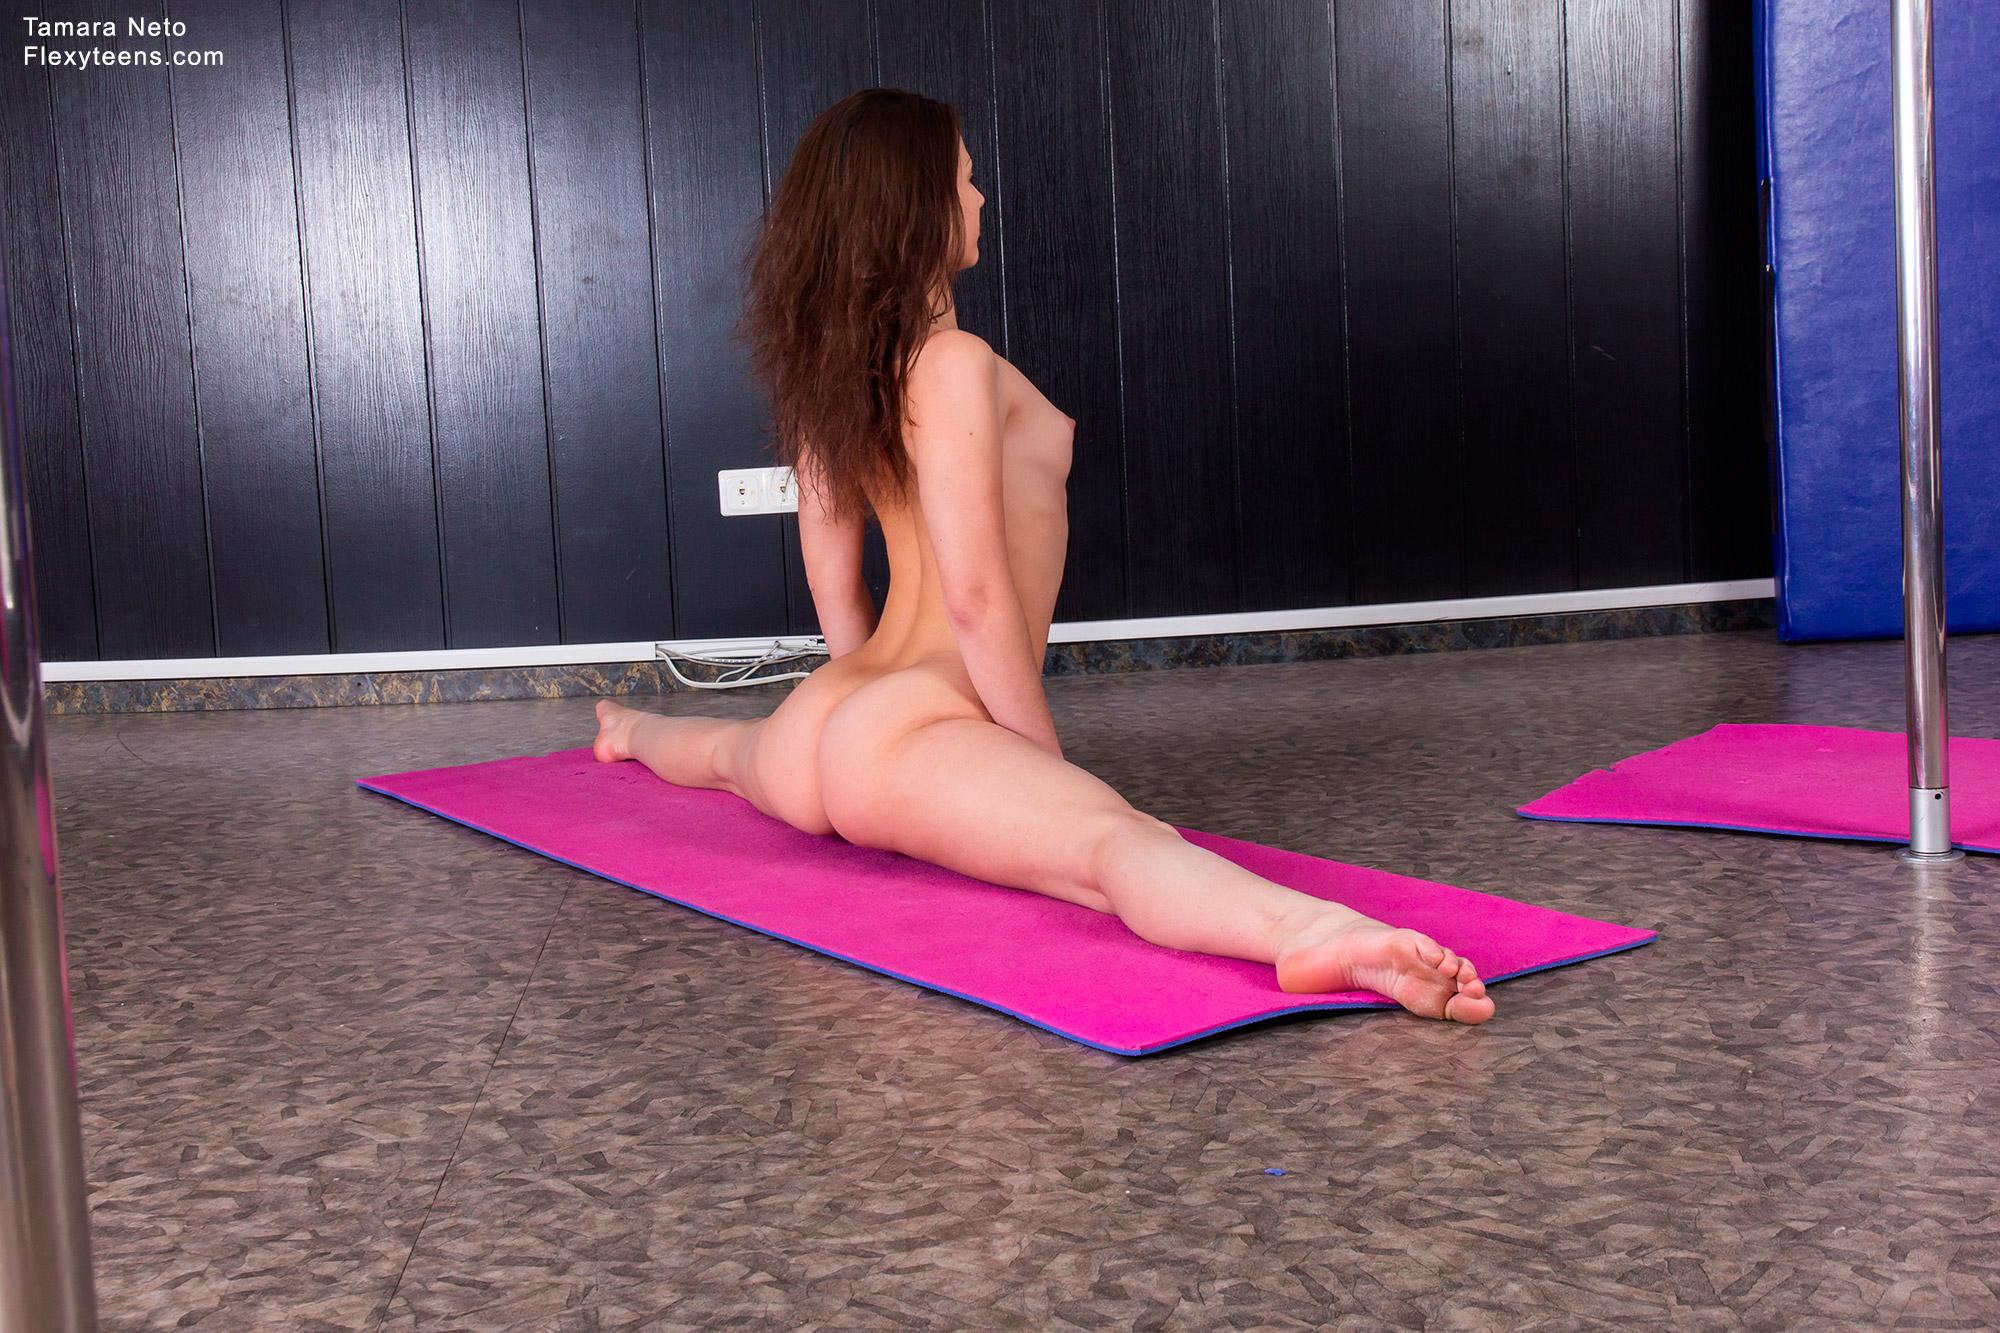 flexible-nude-girls-gymnast-splits-fetish-mix-vol2-84